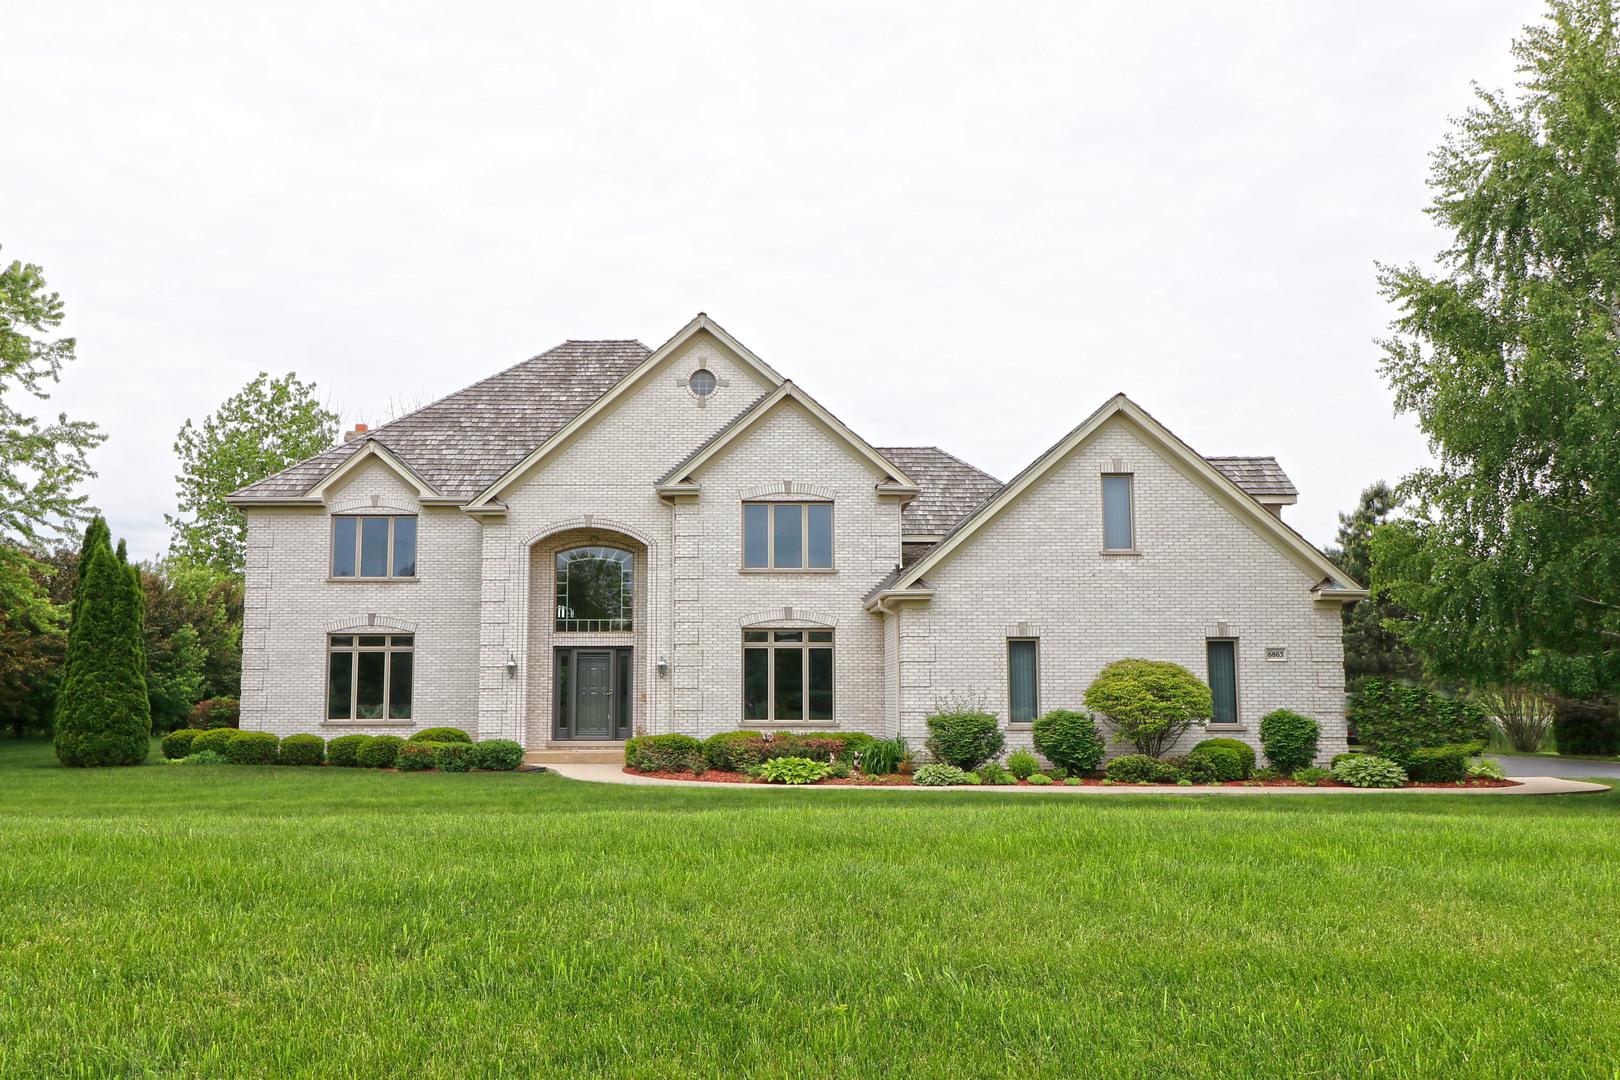 6863 Ellis Drive, Long Grove, Illinois 60047